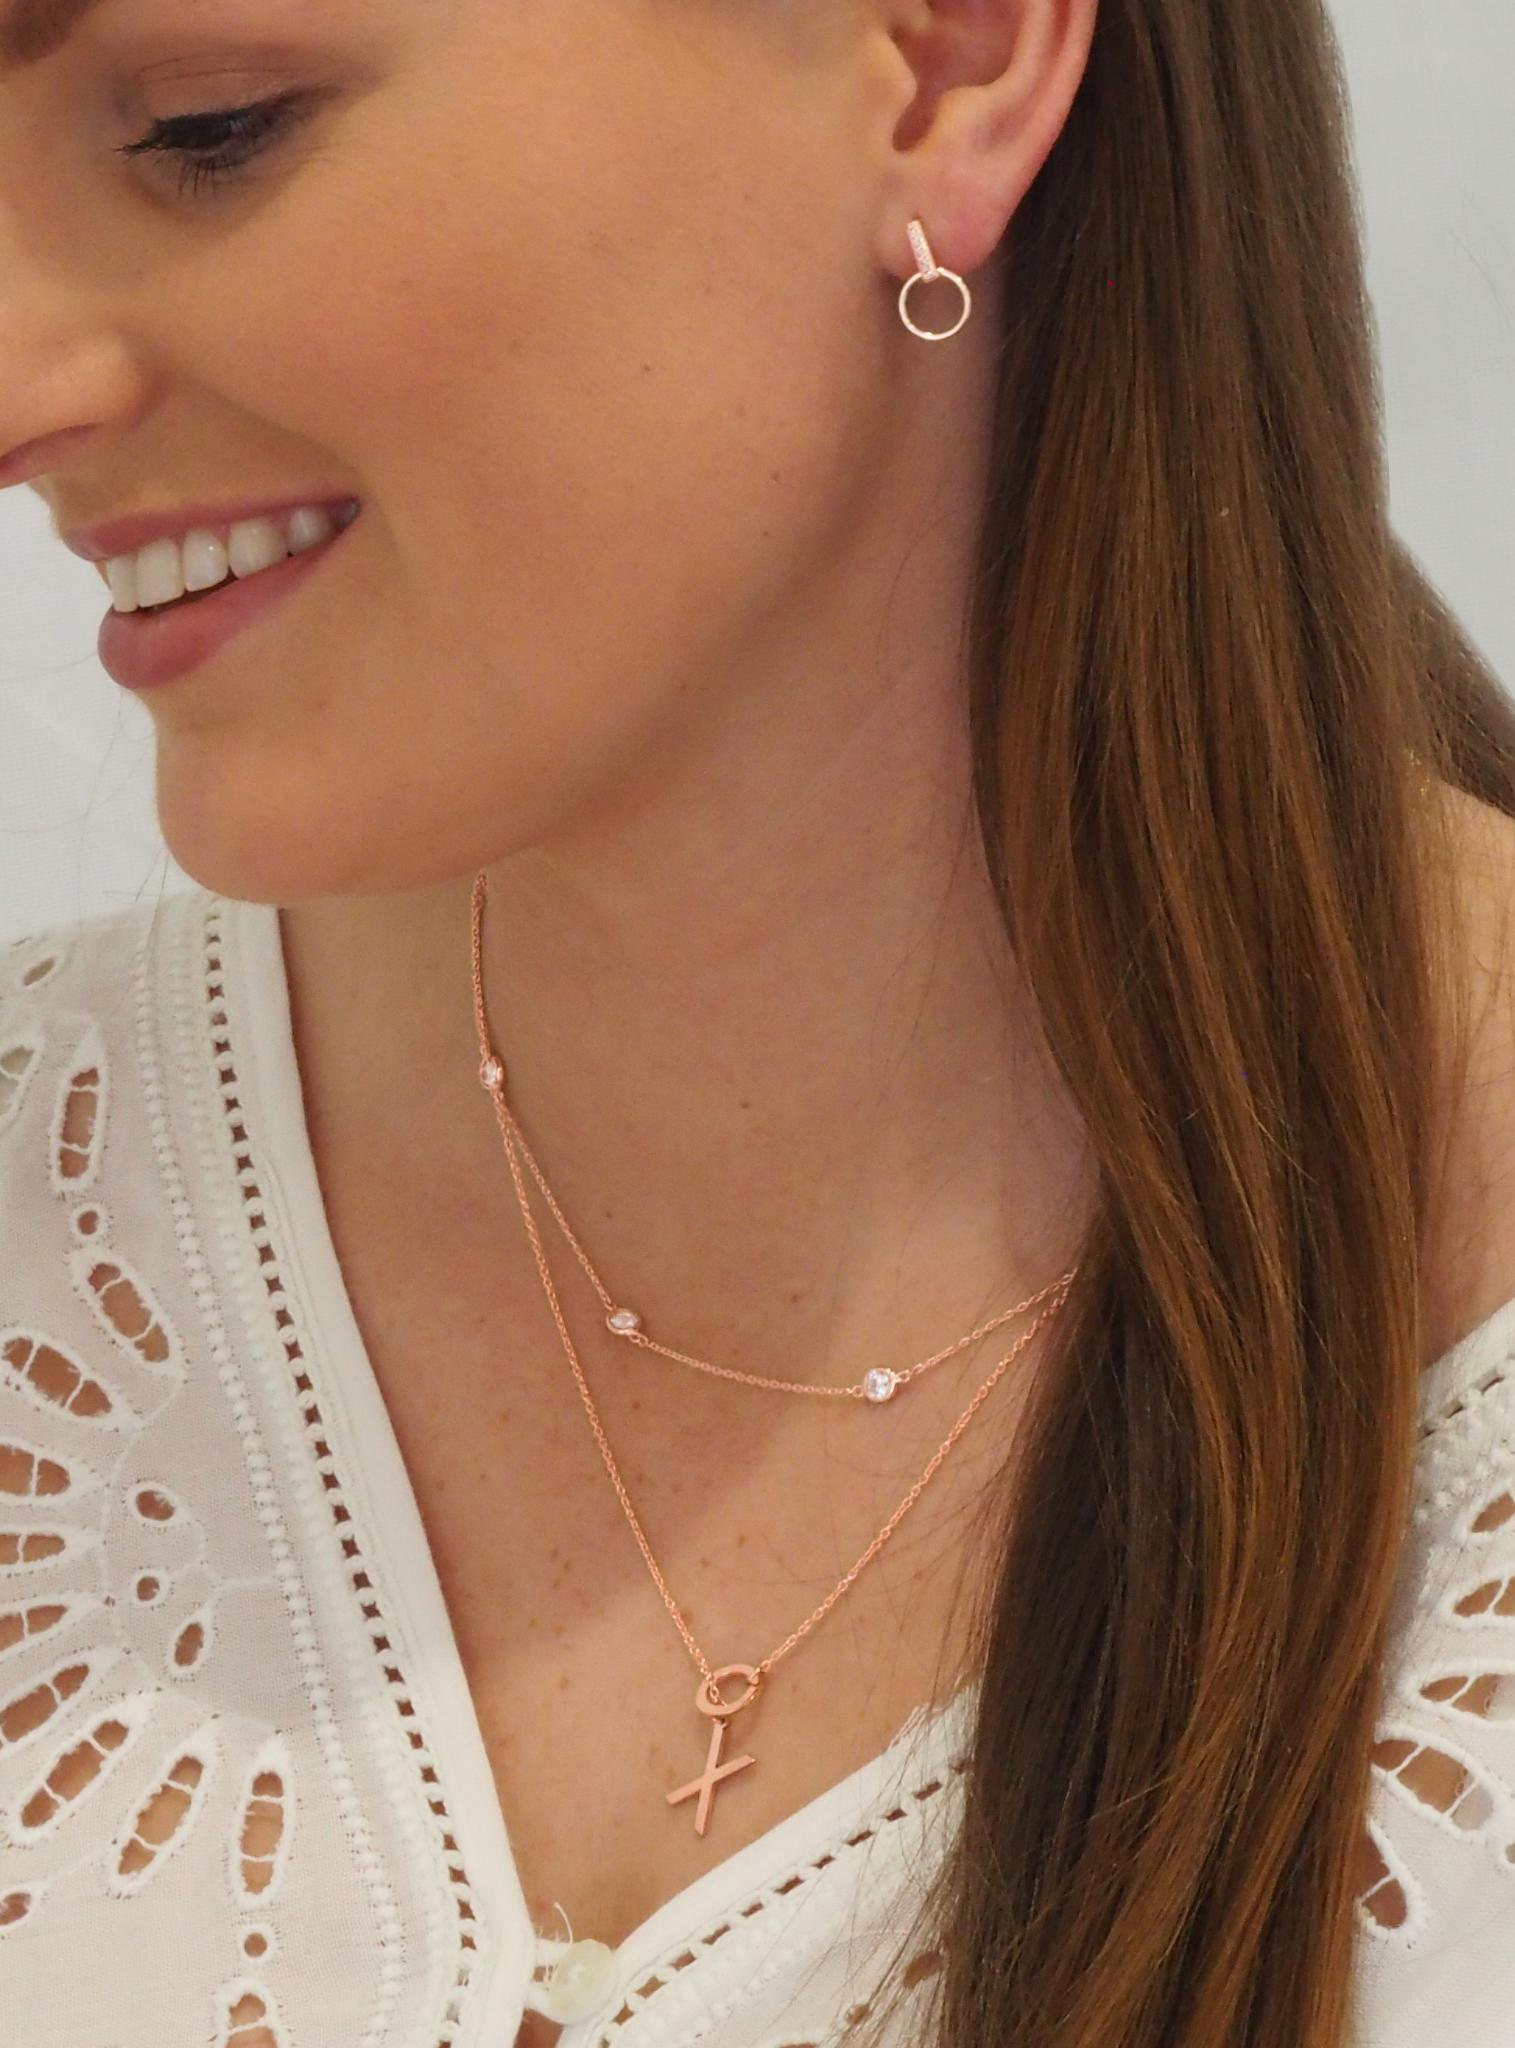 Aurelia Xo Hugs Kisses Charm Necklace In 9ct Rose Gold The Jewel Shop